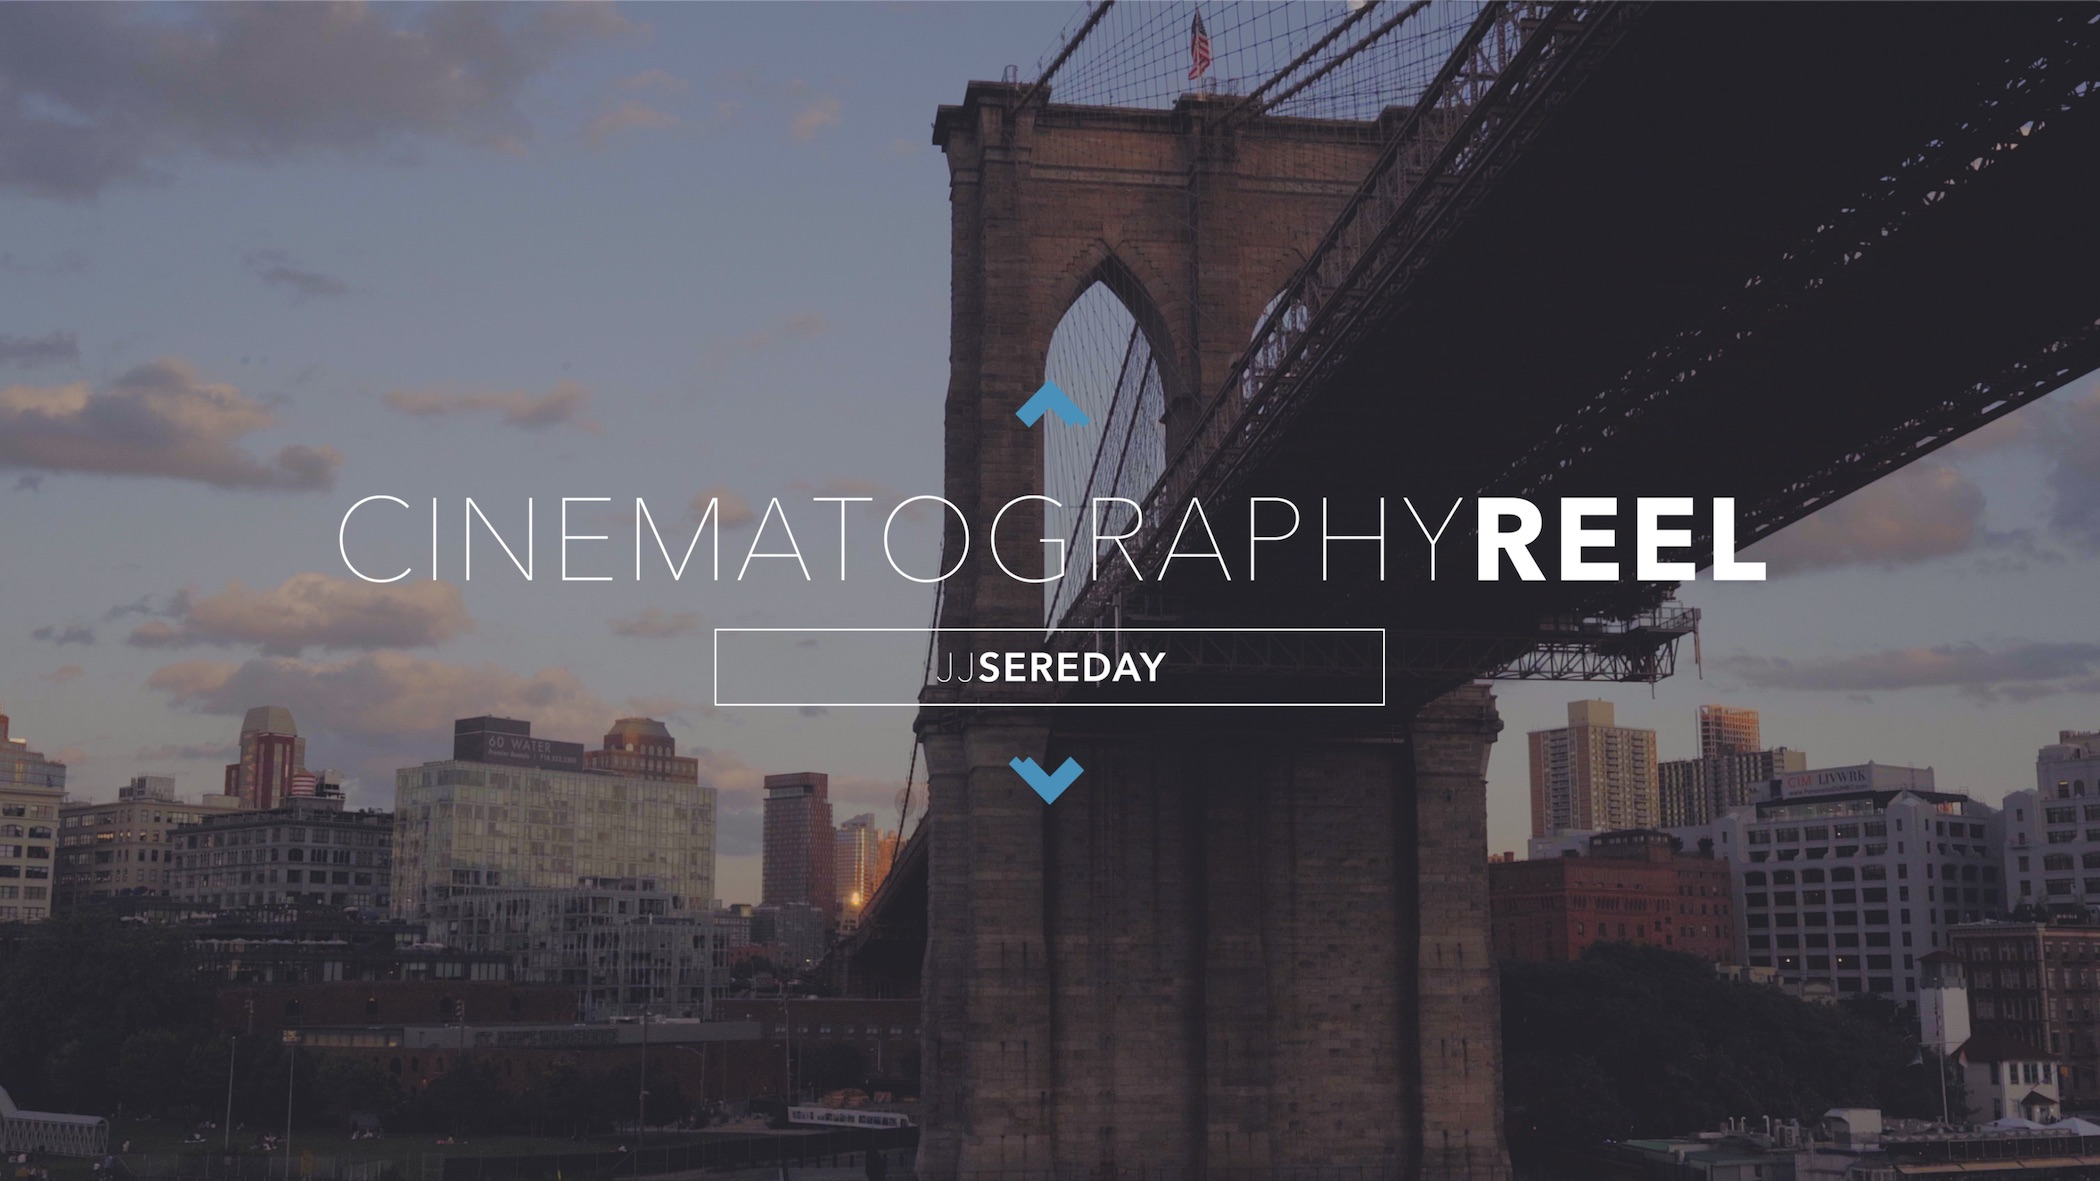 2018 Cinematography Reel Thumbnail